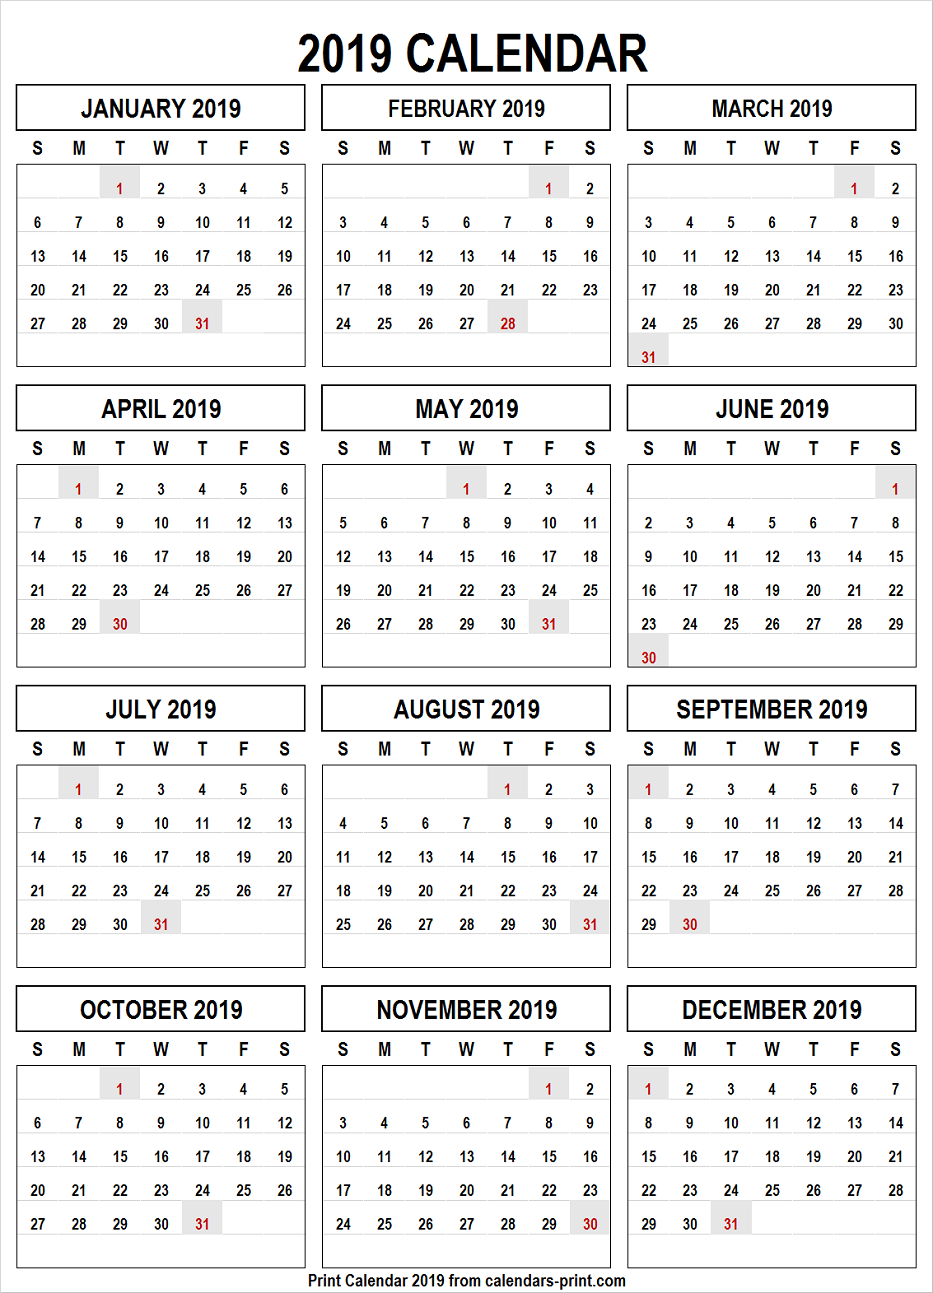 Calendar 2019 Png Free Download Weekly Calendar Template June Calendar Printable Free Calendar Template